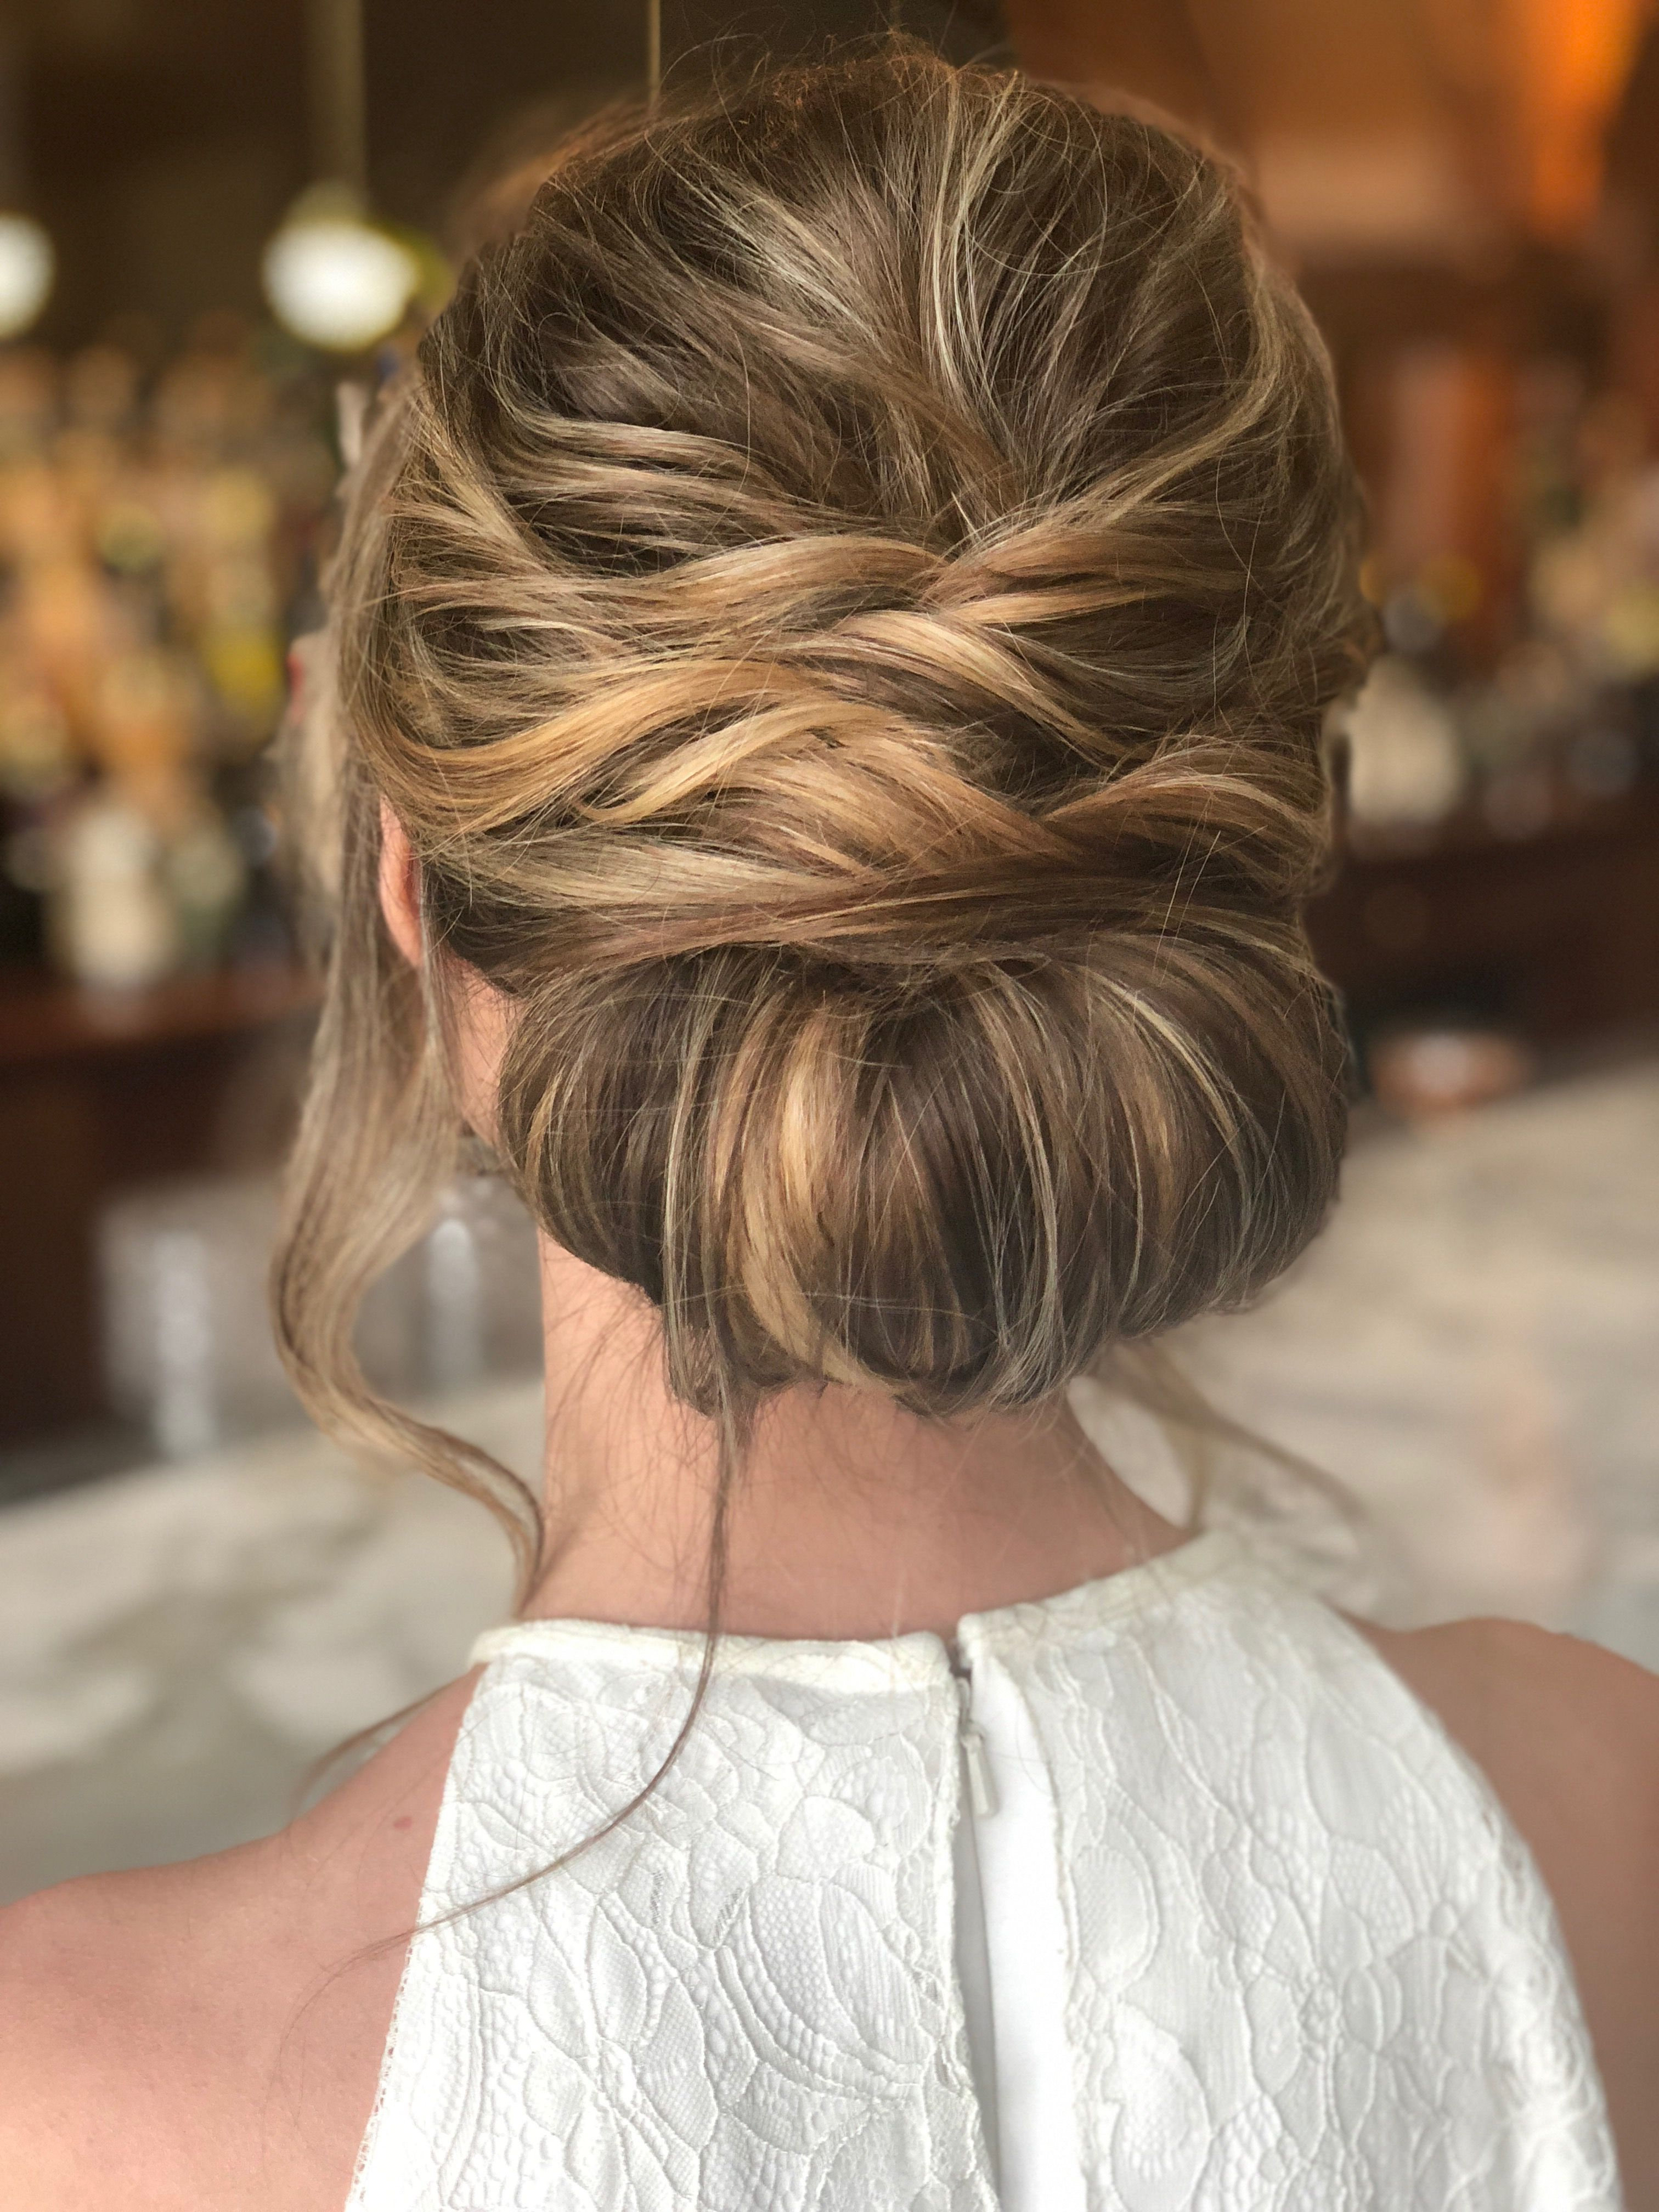 Pin by omika hobbs on wedding hairstyles pinterest updo boho